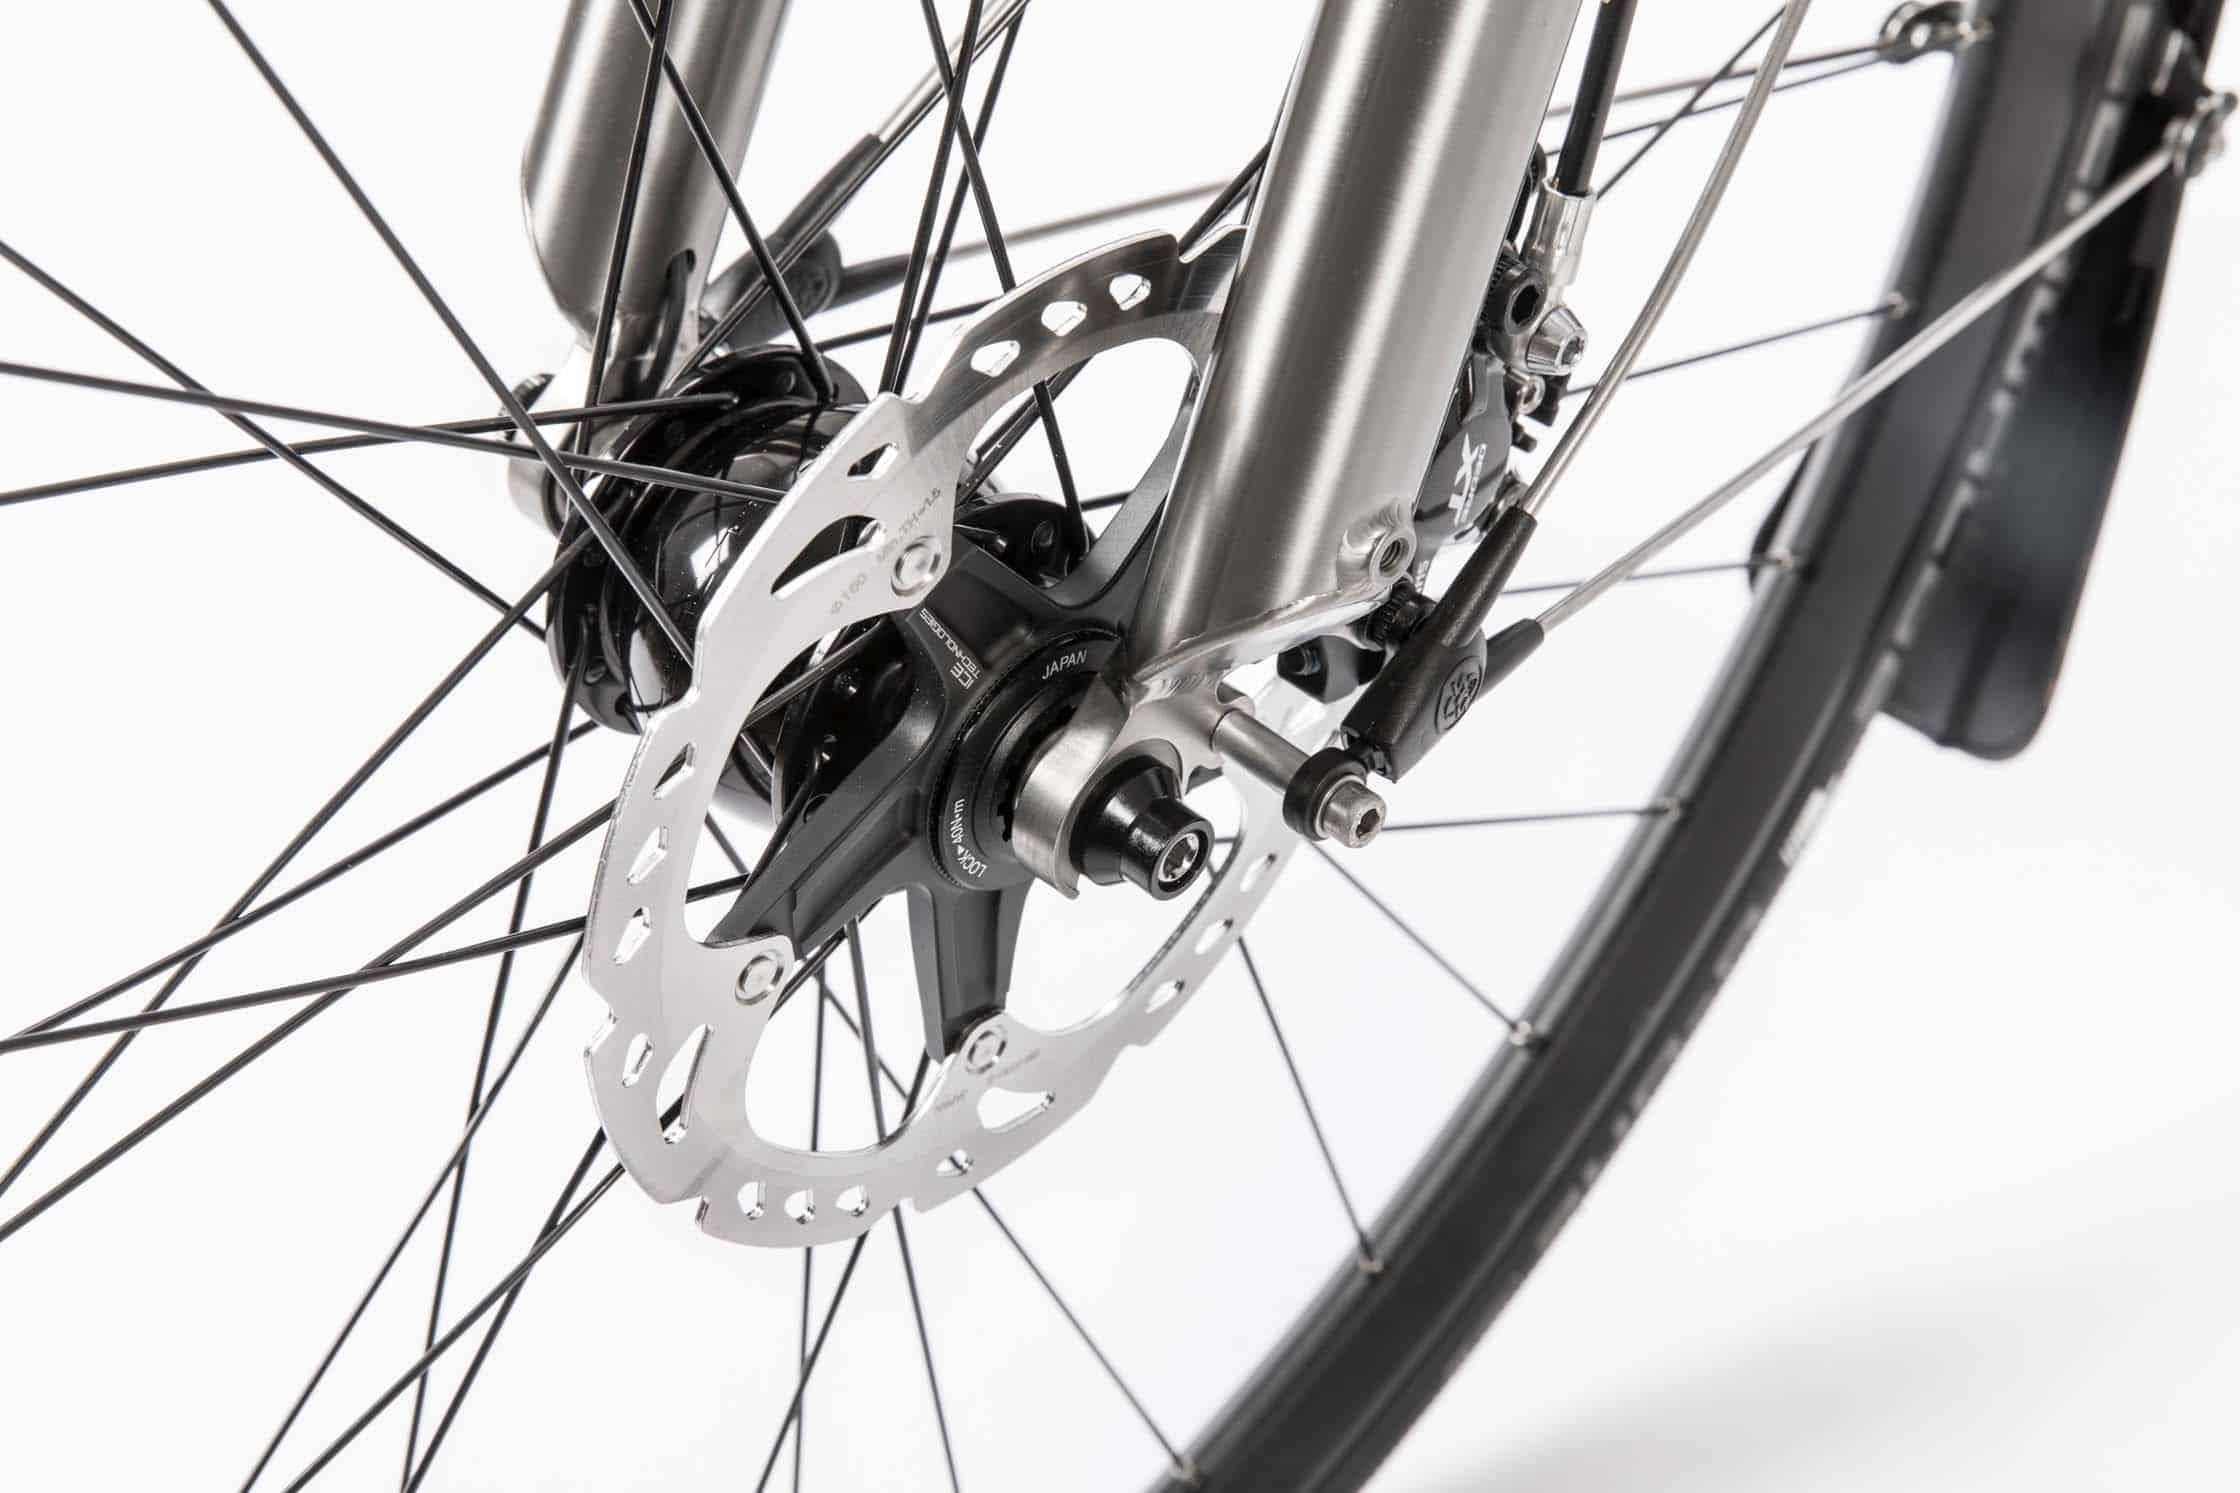 Urban_Pinion_Bike_04_min